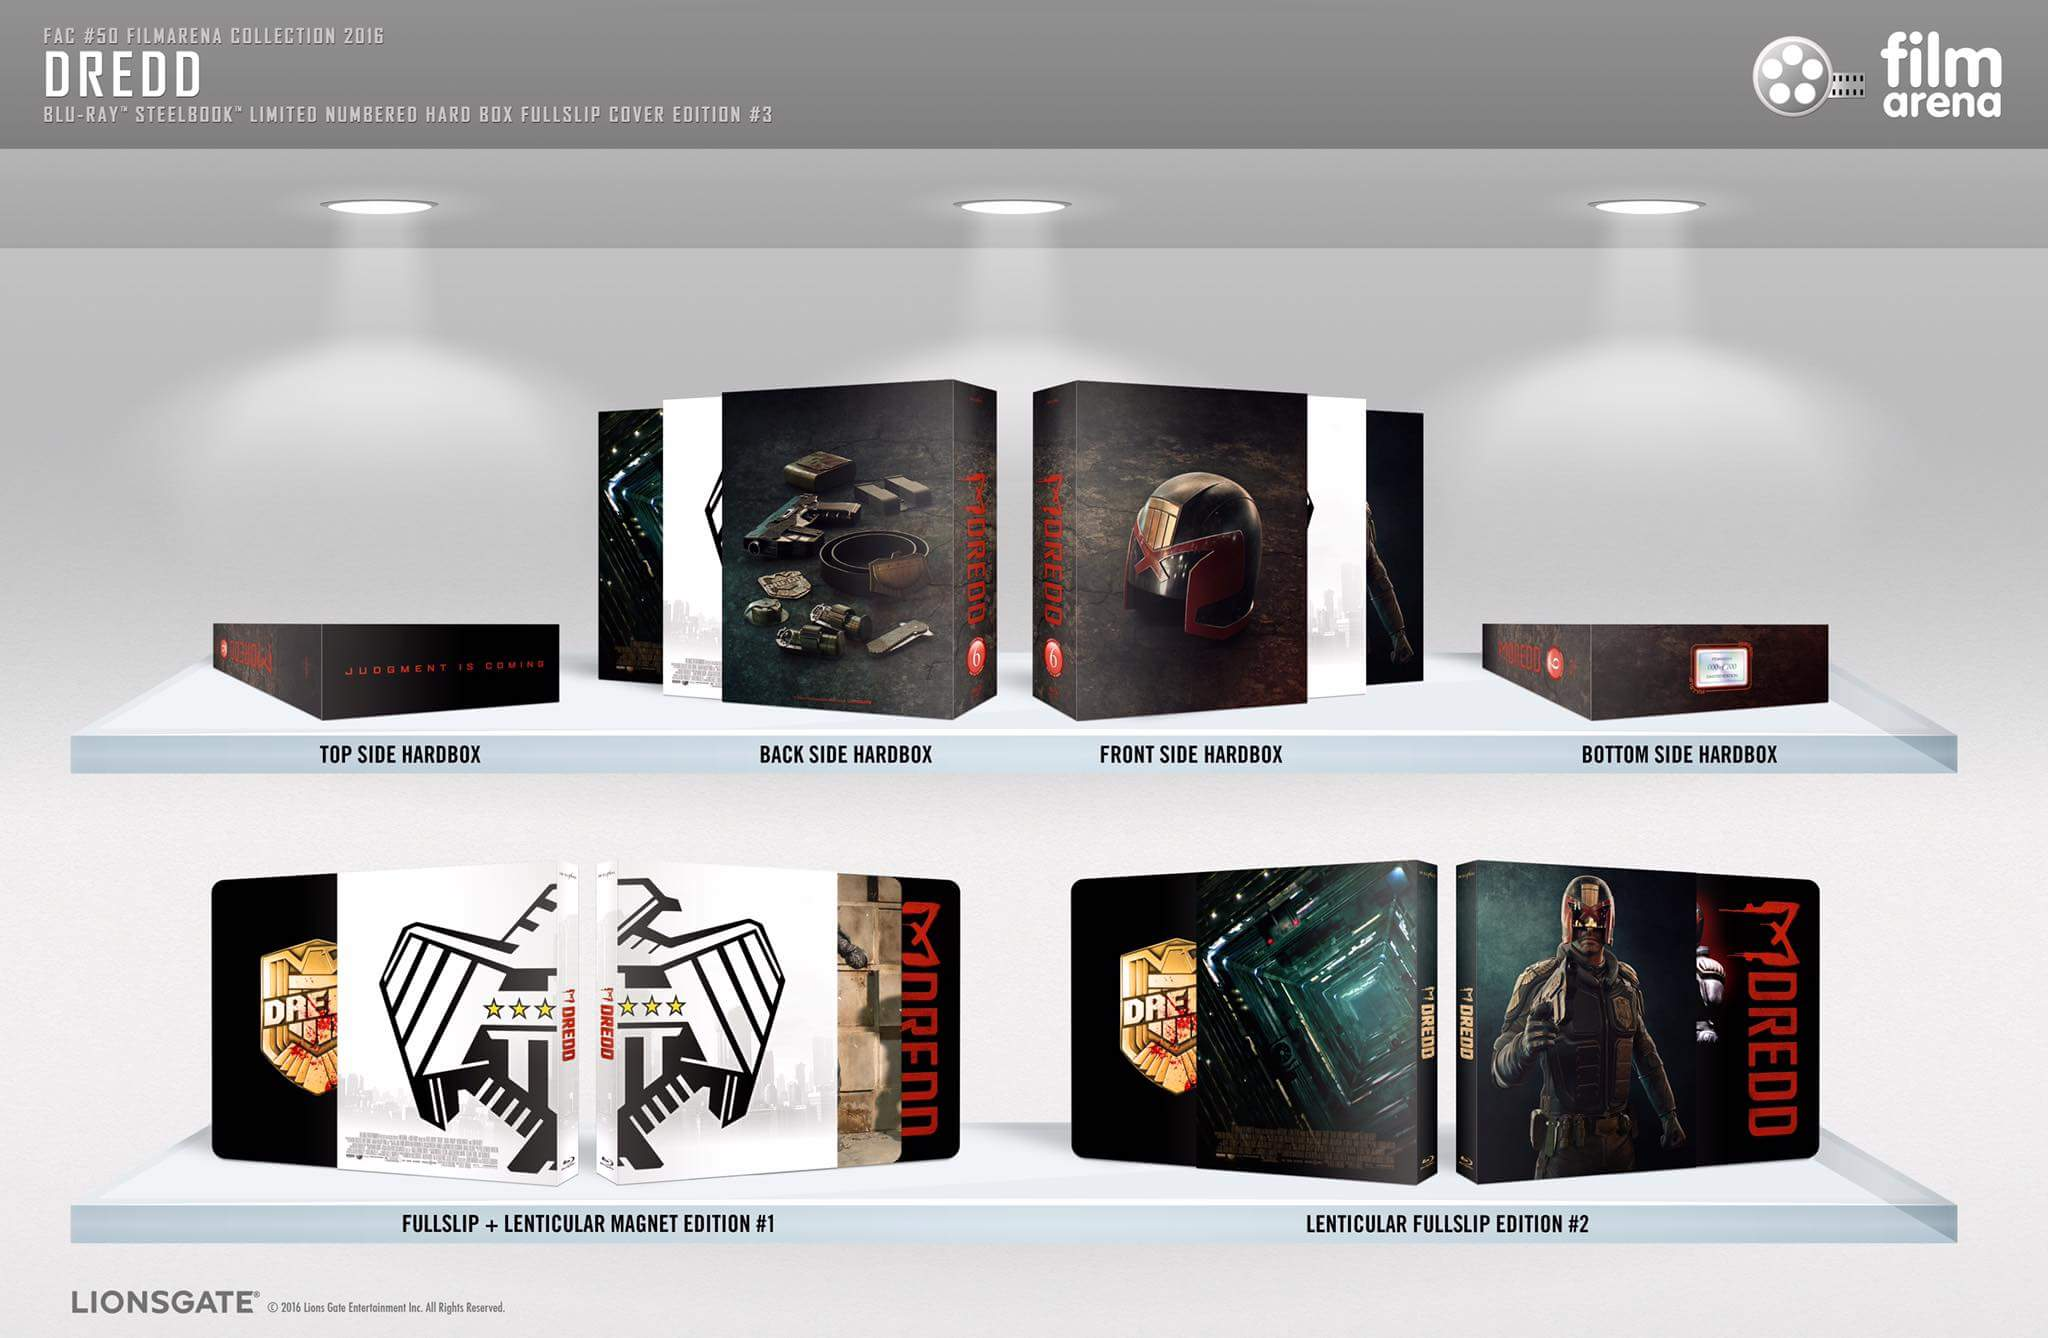 dredd-steelbook-filmarena-4